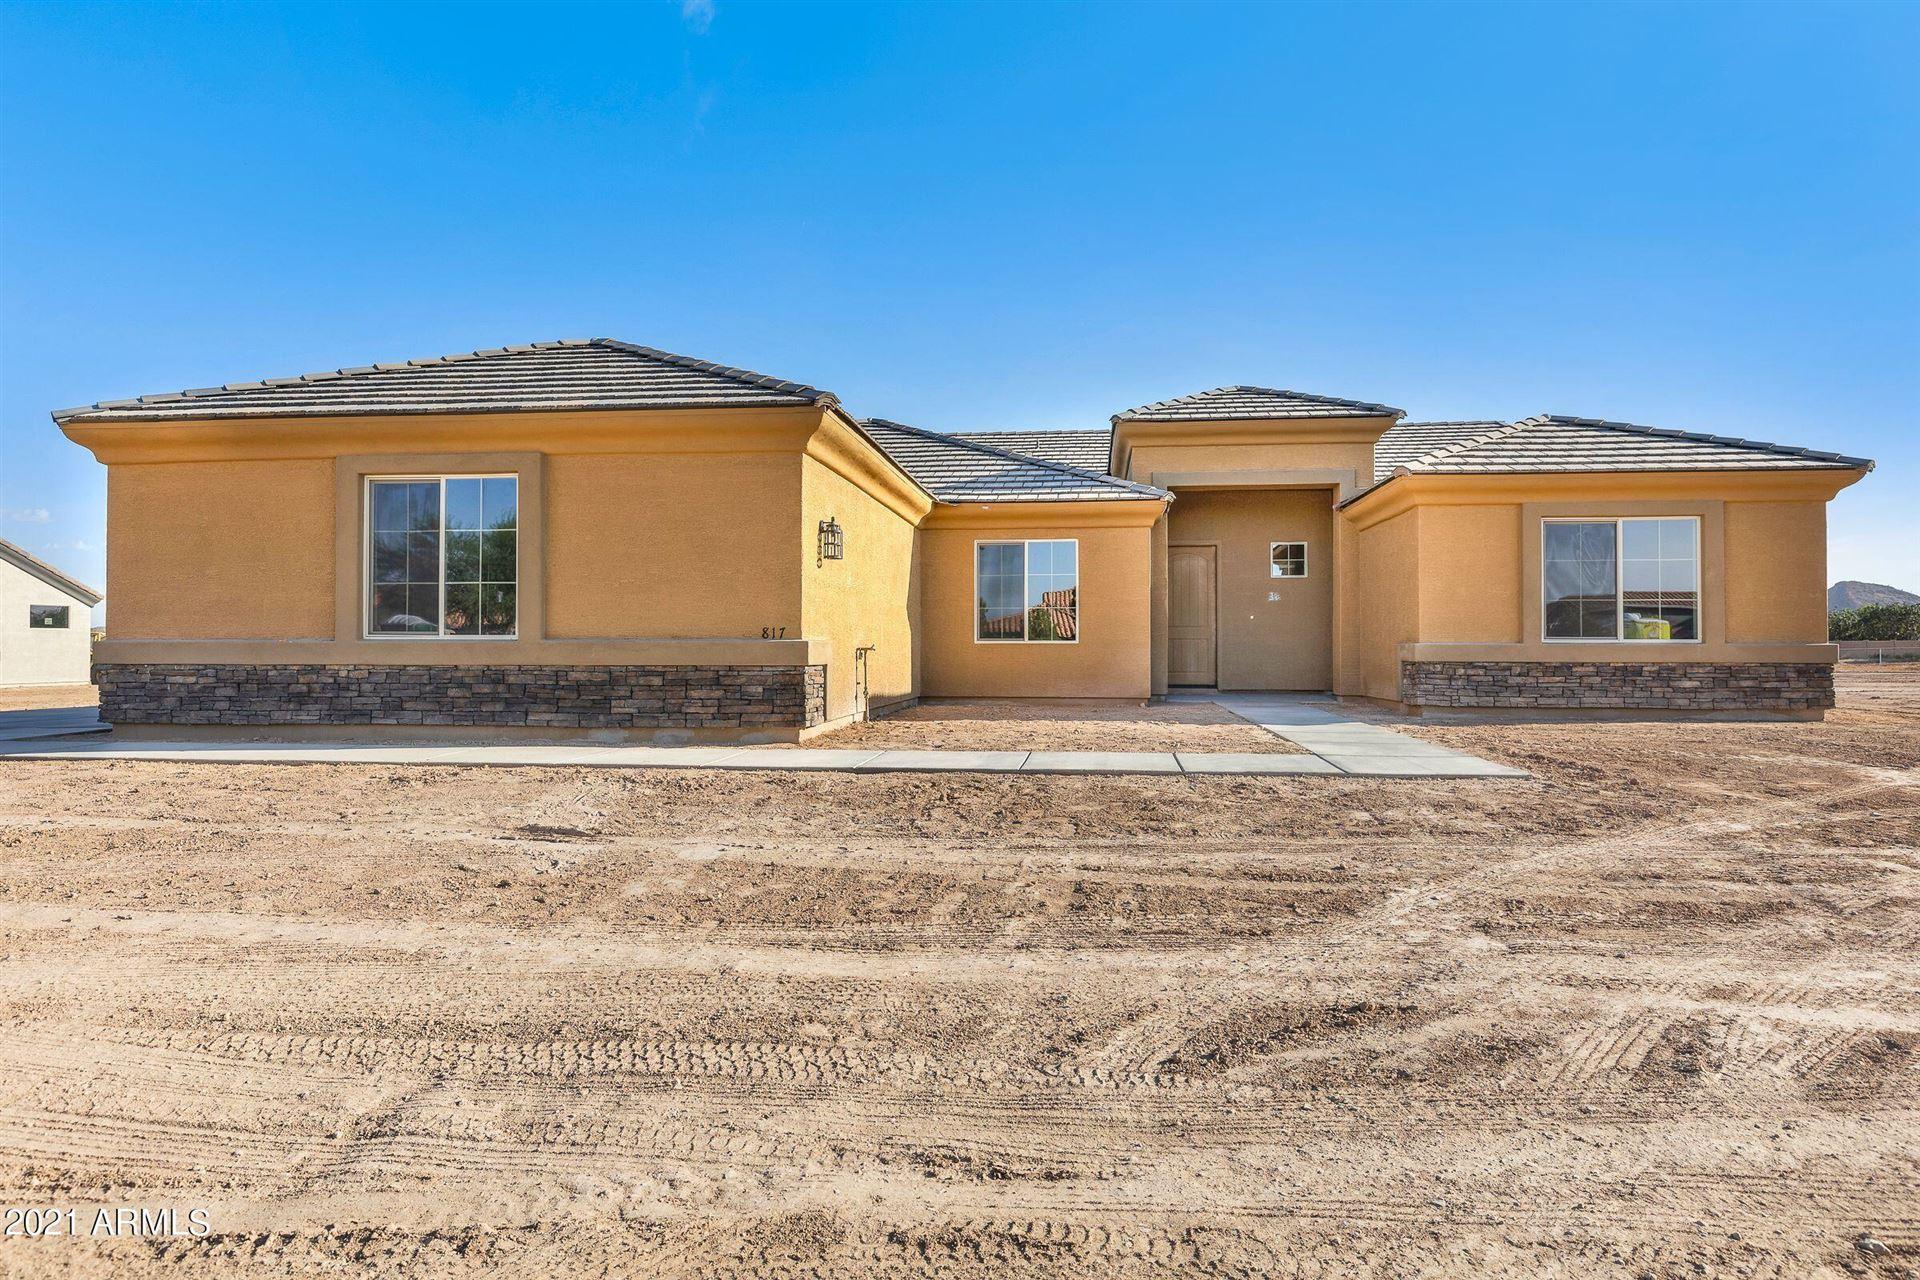 0000 W RHONDA VIEW -- #3, Queen Creek, AZ 85142 - #: 6087413